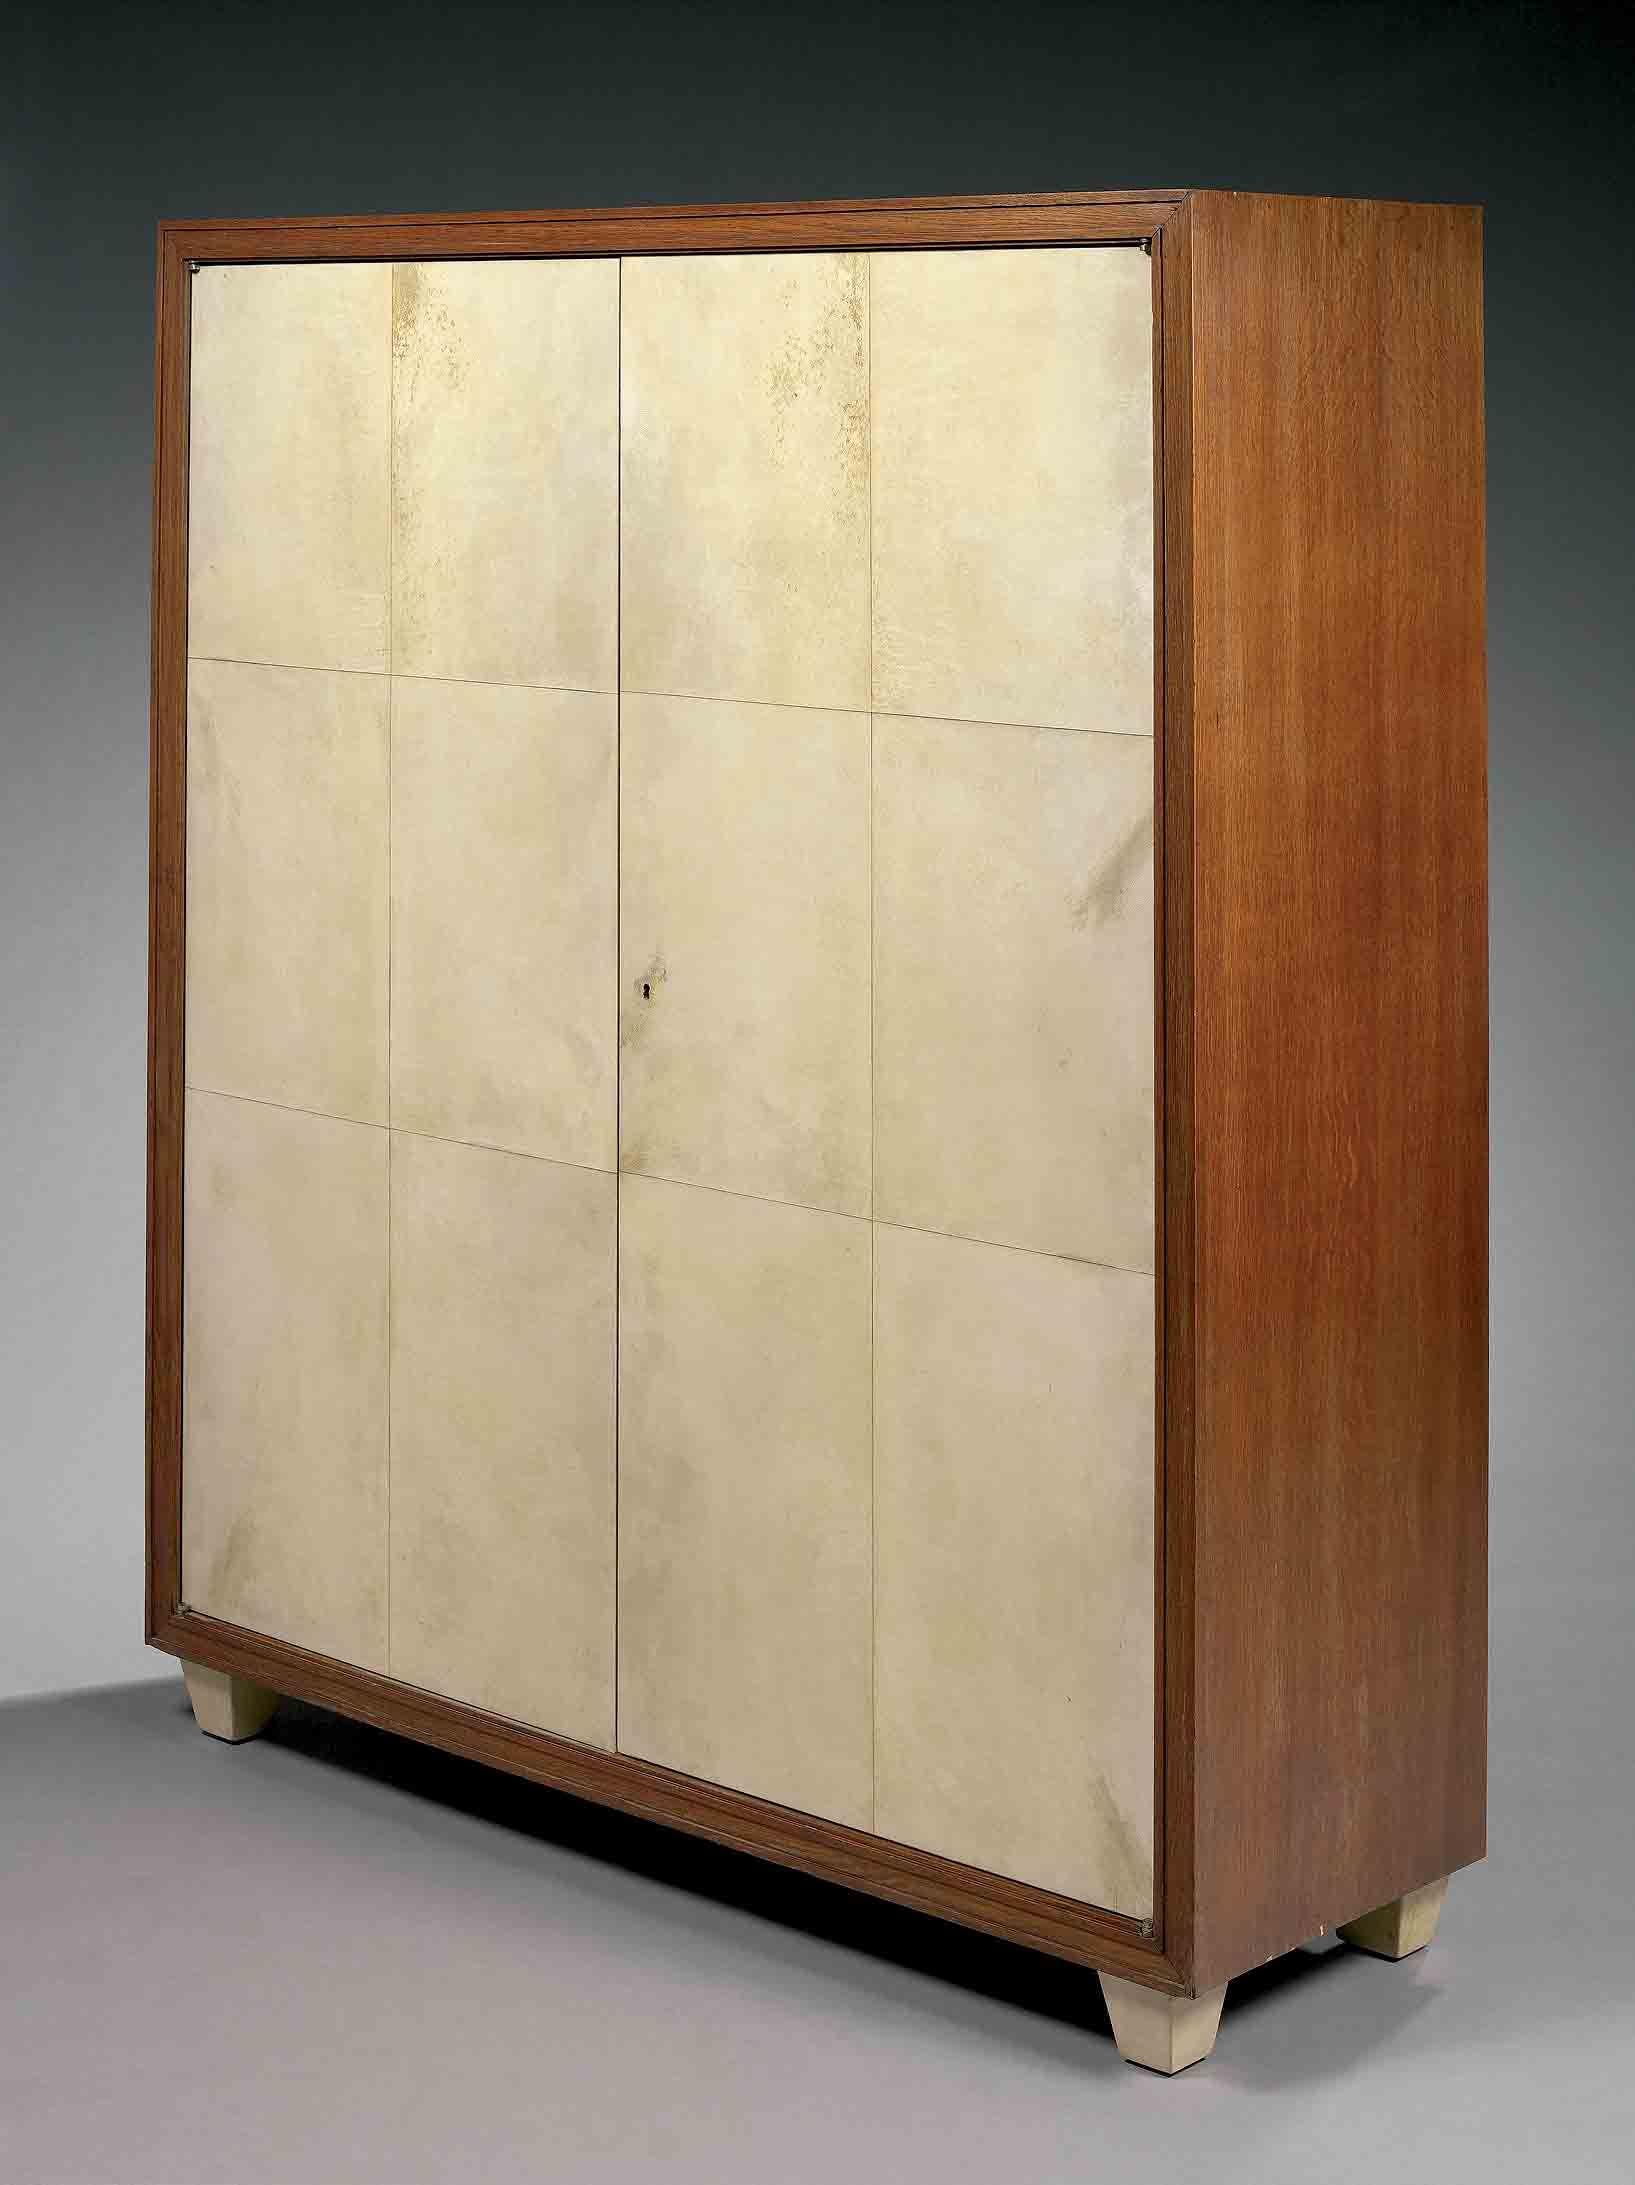 Jean-Michel Frank (1895-1941) & Adolphe Chanaux (1887-1965) armoire ...